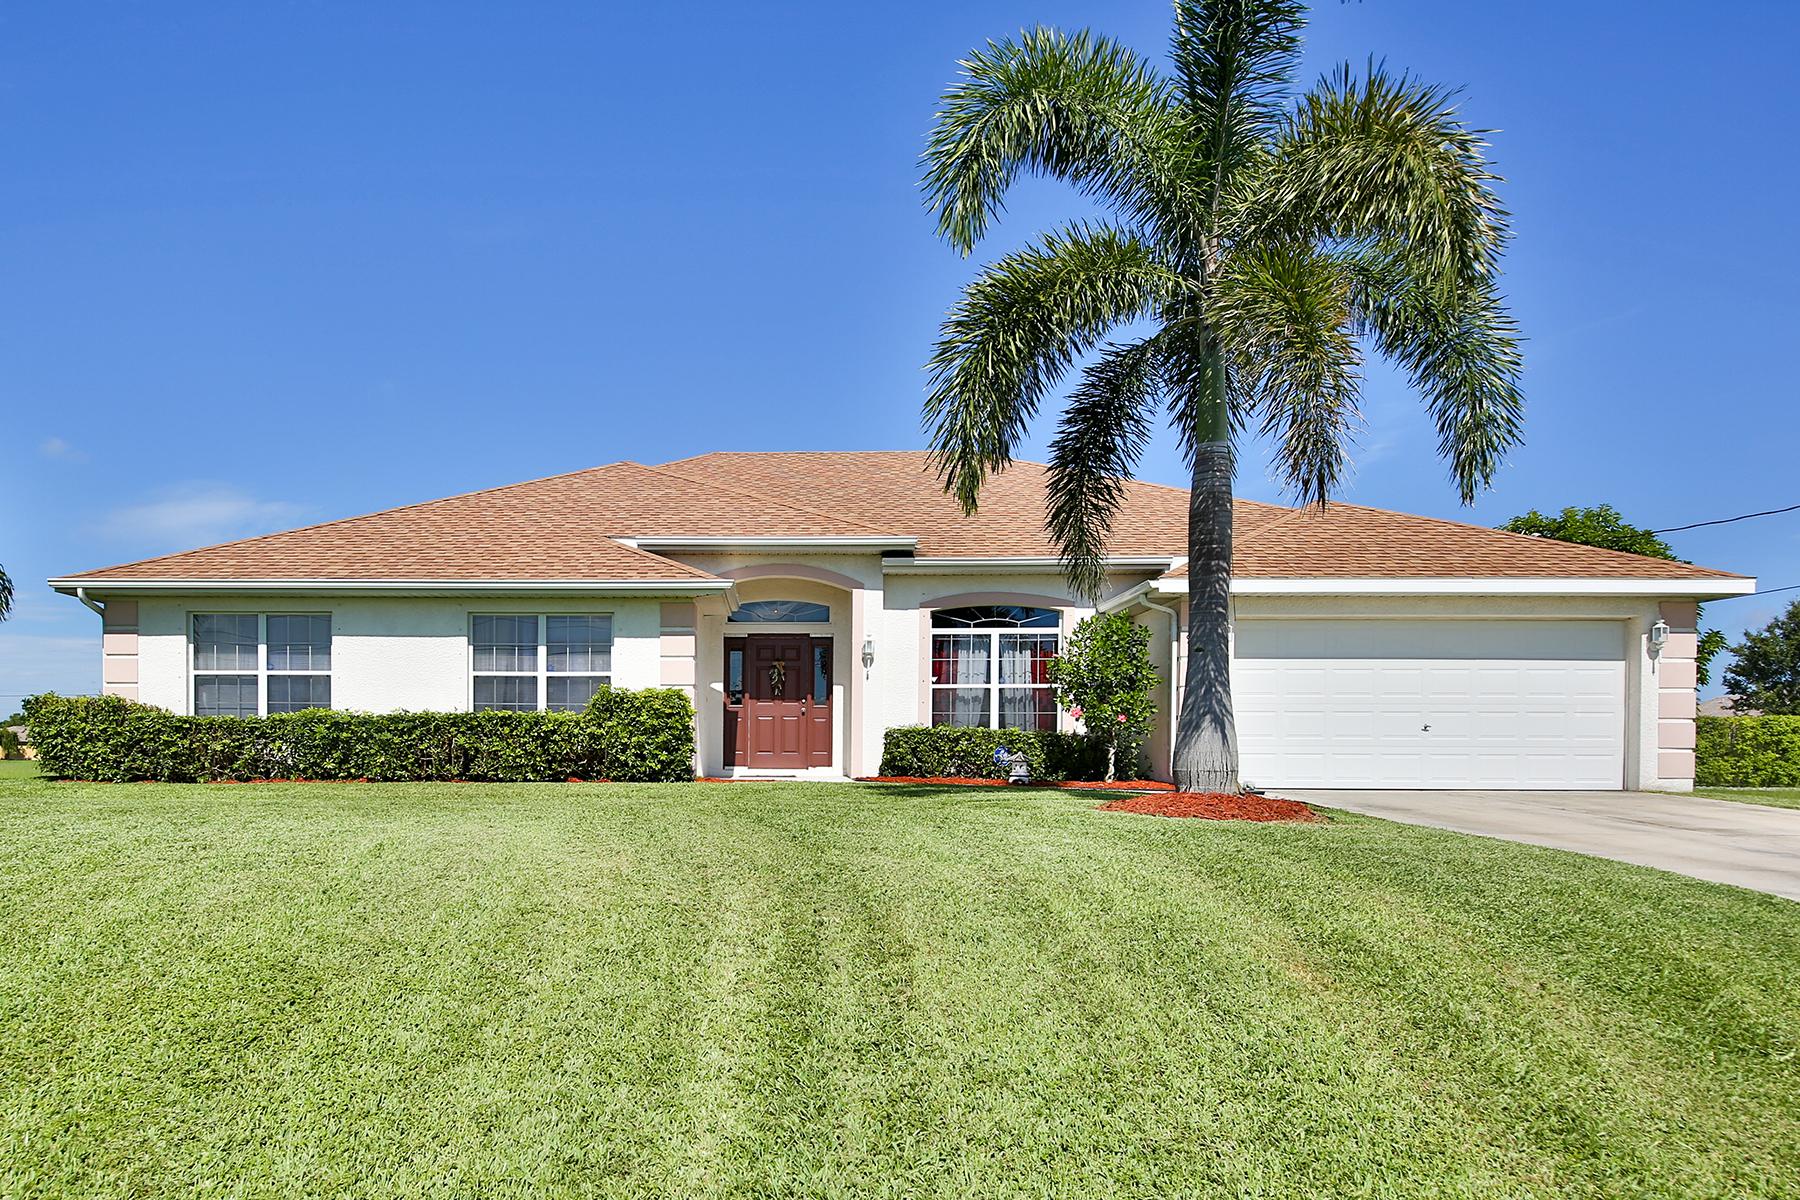 Moradia para Venda às CAPE CORAL 930 NW Juanita Pl Cape Coral, Florida, 33993 Estados Unidos